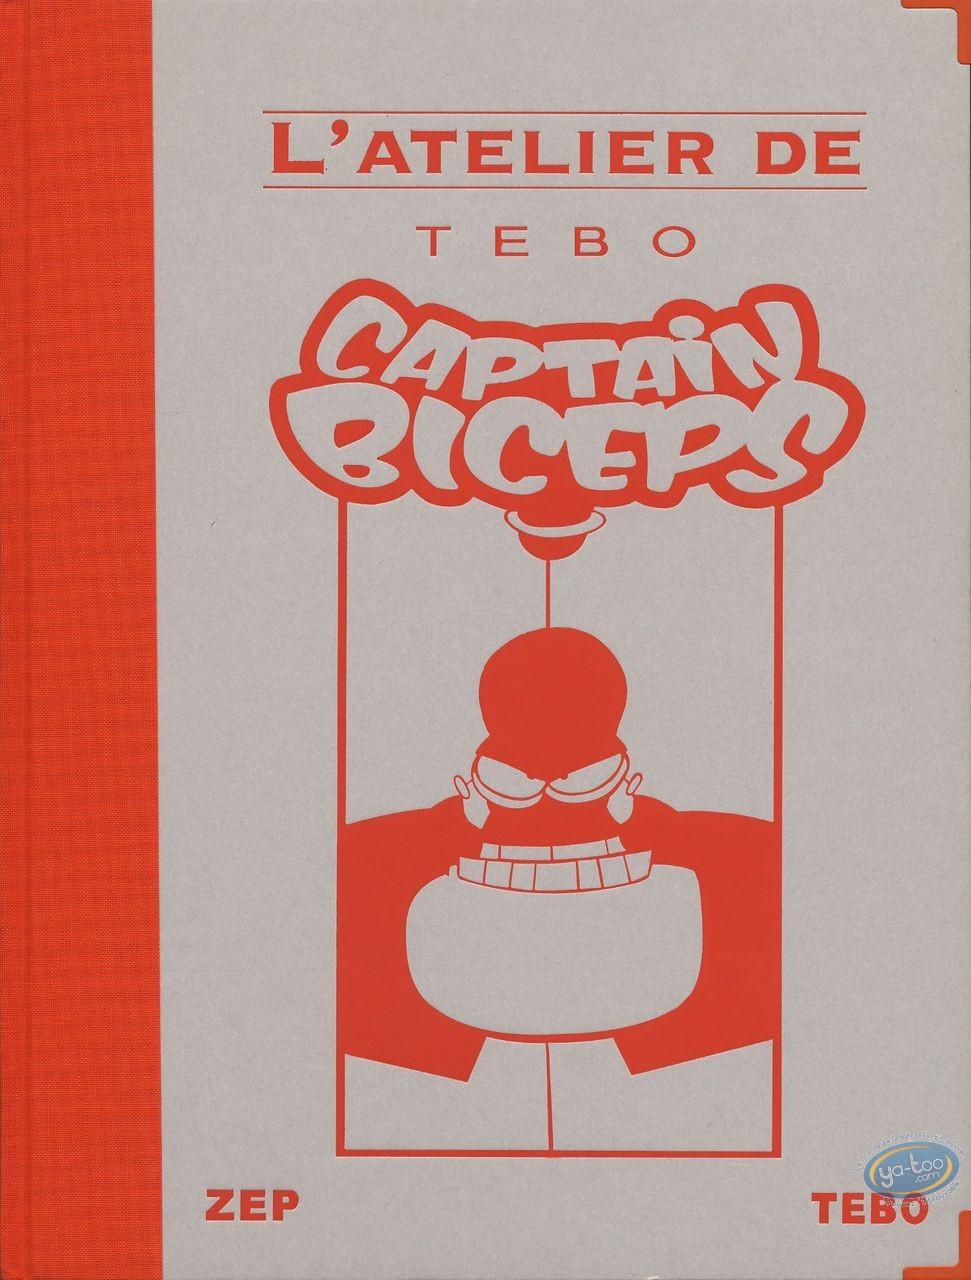 Special Edition, Captain Biceps : Captain Biceps